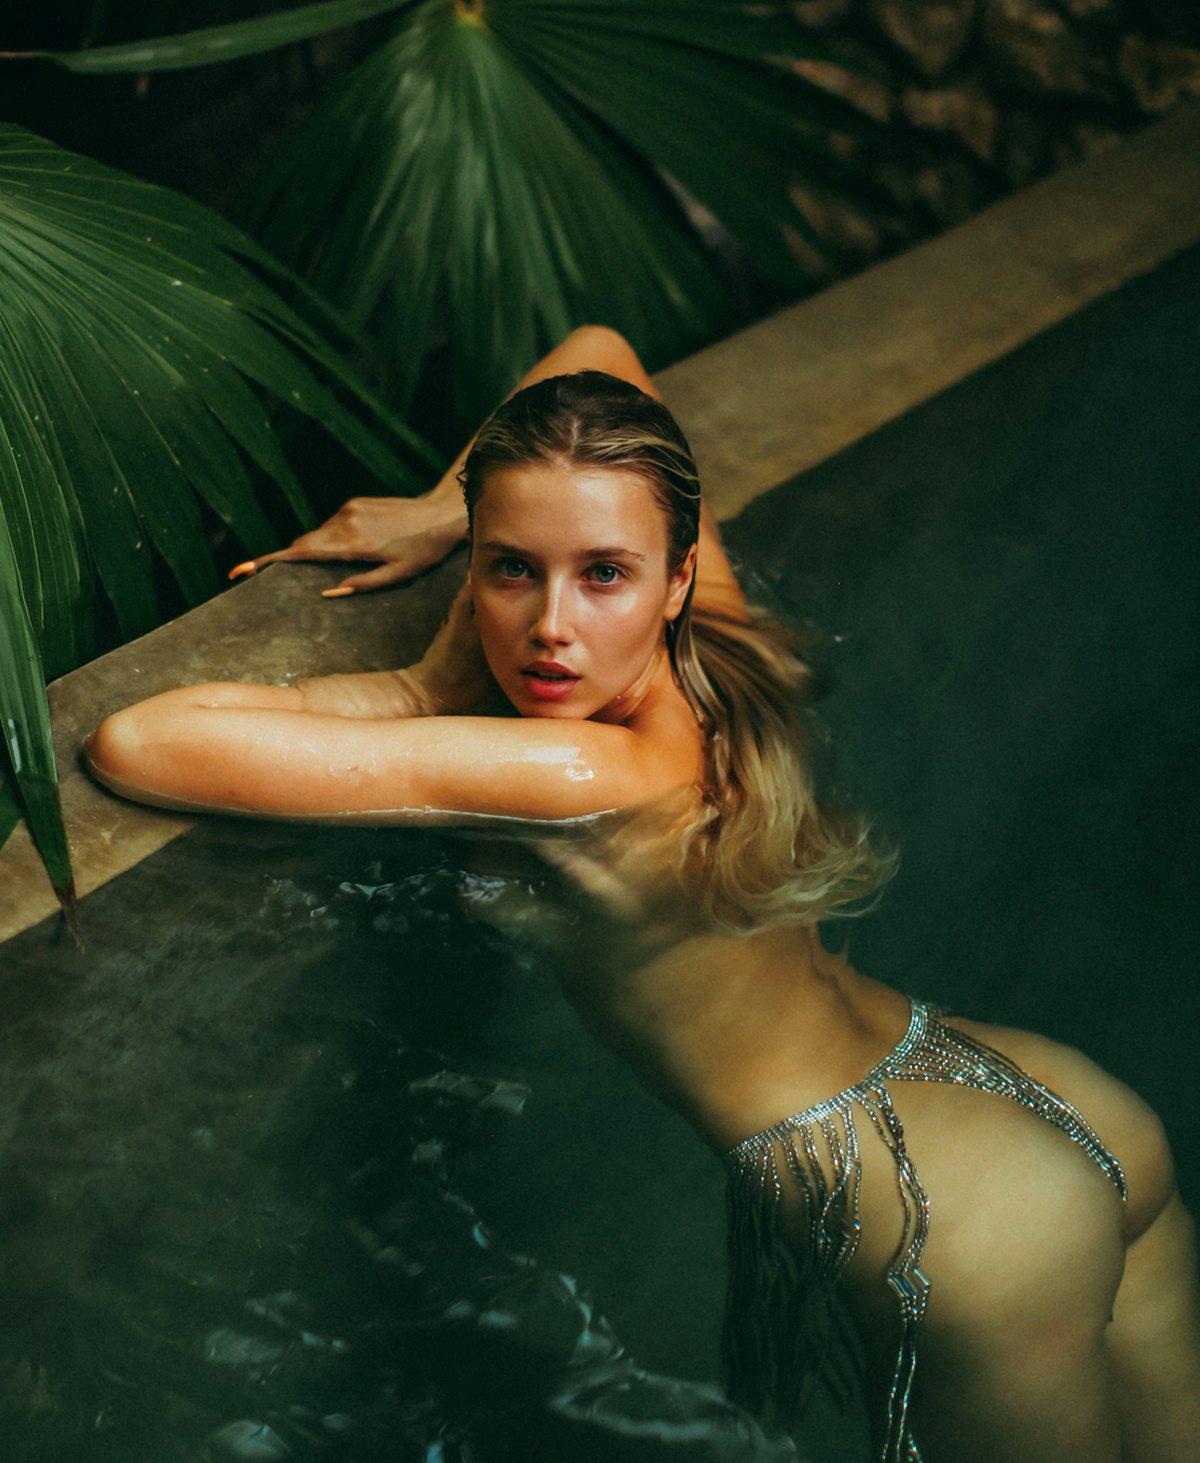 Polina Malinovskaya Polinamalinovskaya Instagram Nude Leaks 0019